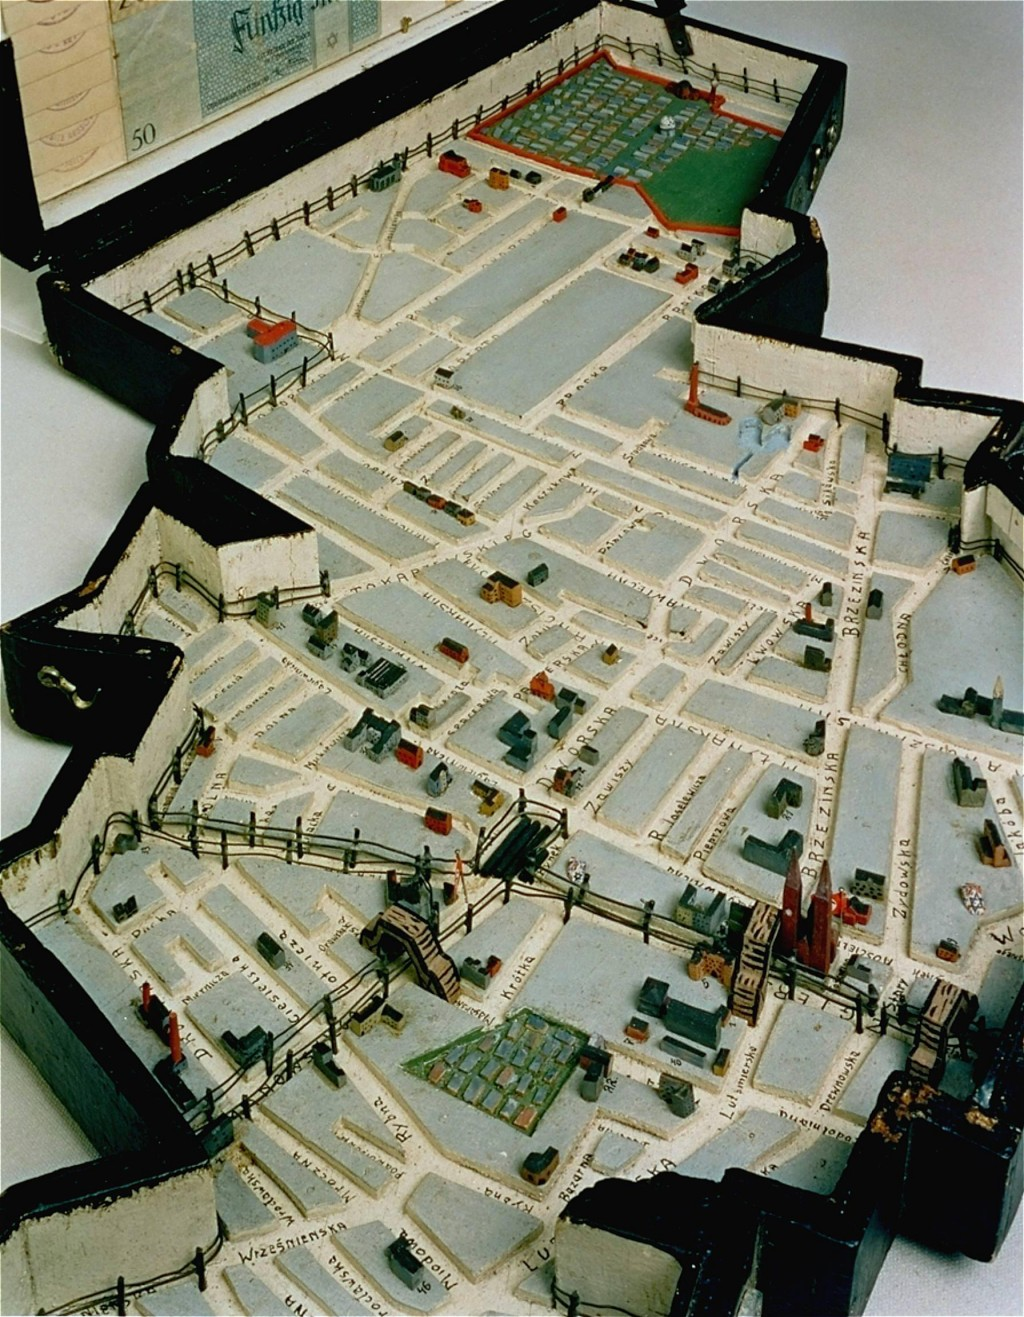 Lodz ghetto model [LCID: 2004gcax]